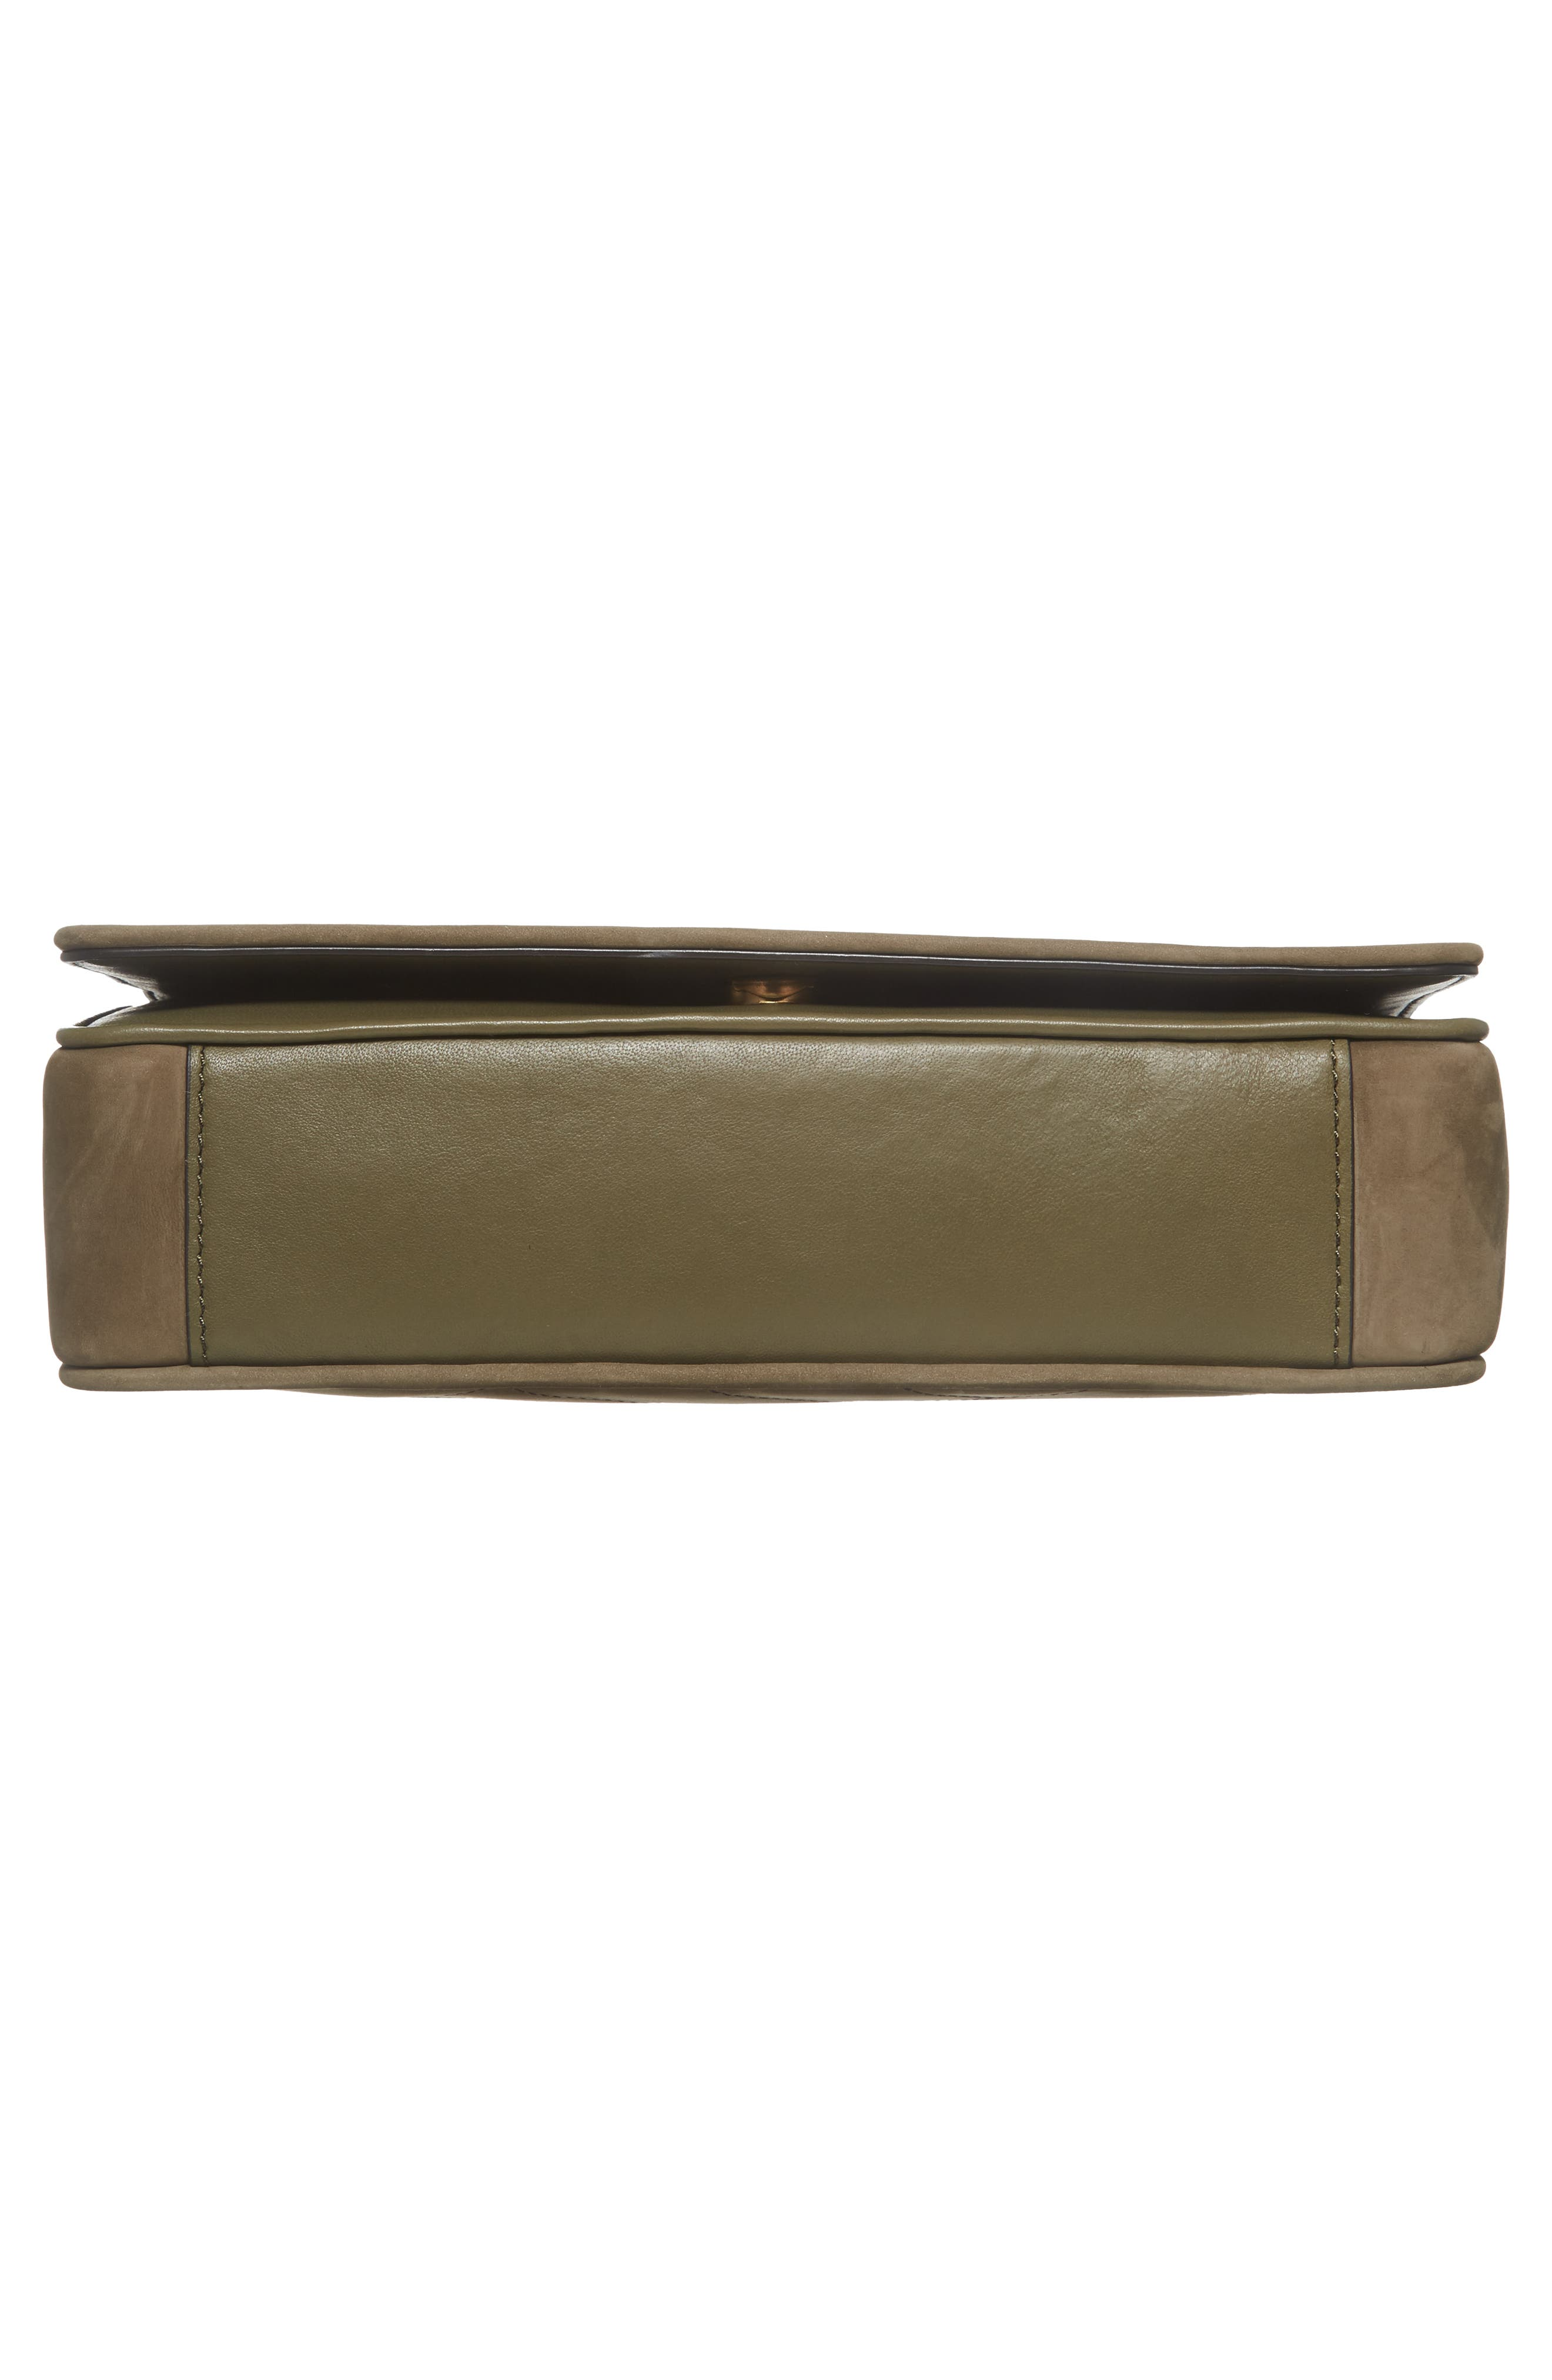 Alexa Leather Shoulder Bag,                             Alternate thumbnail 29, color,